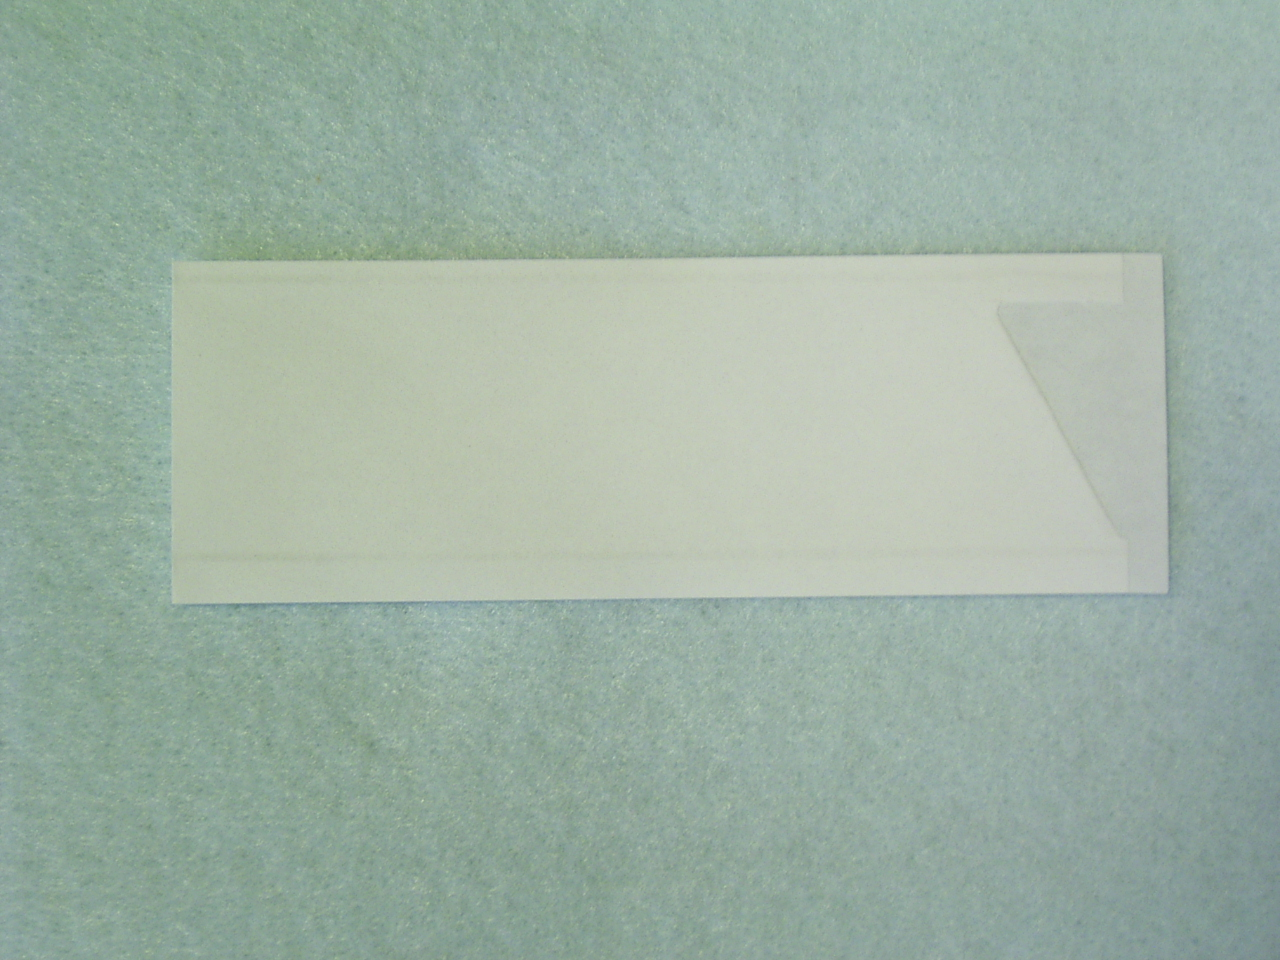 箸袋 S32 白無地(上質紙) 32×90mm 10,000枚